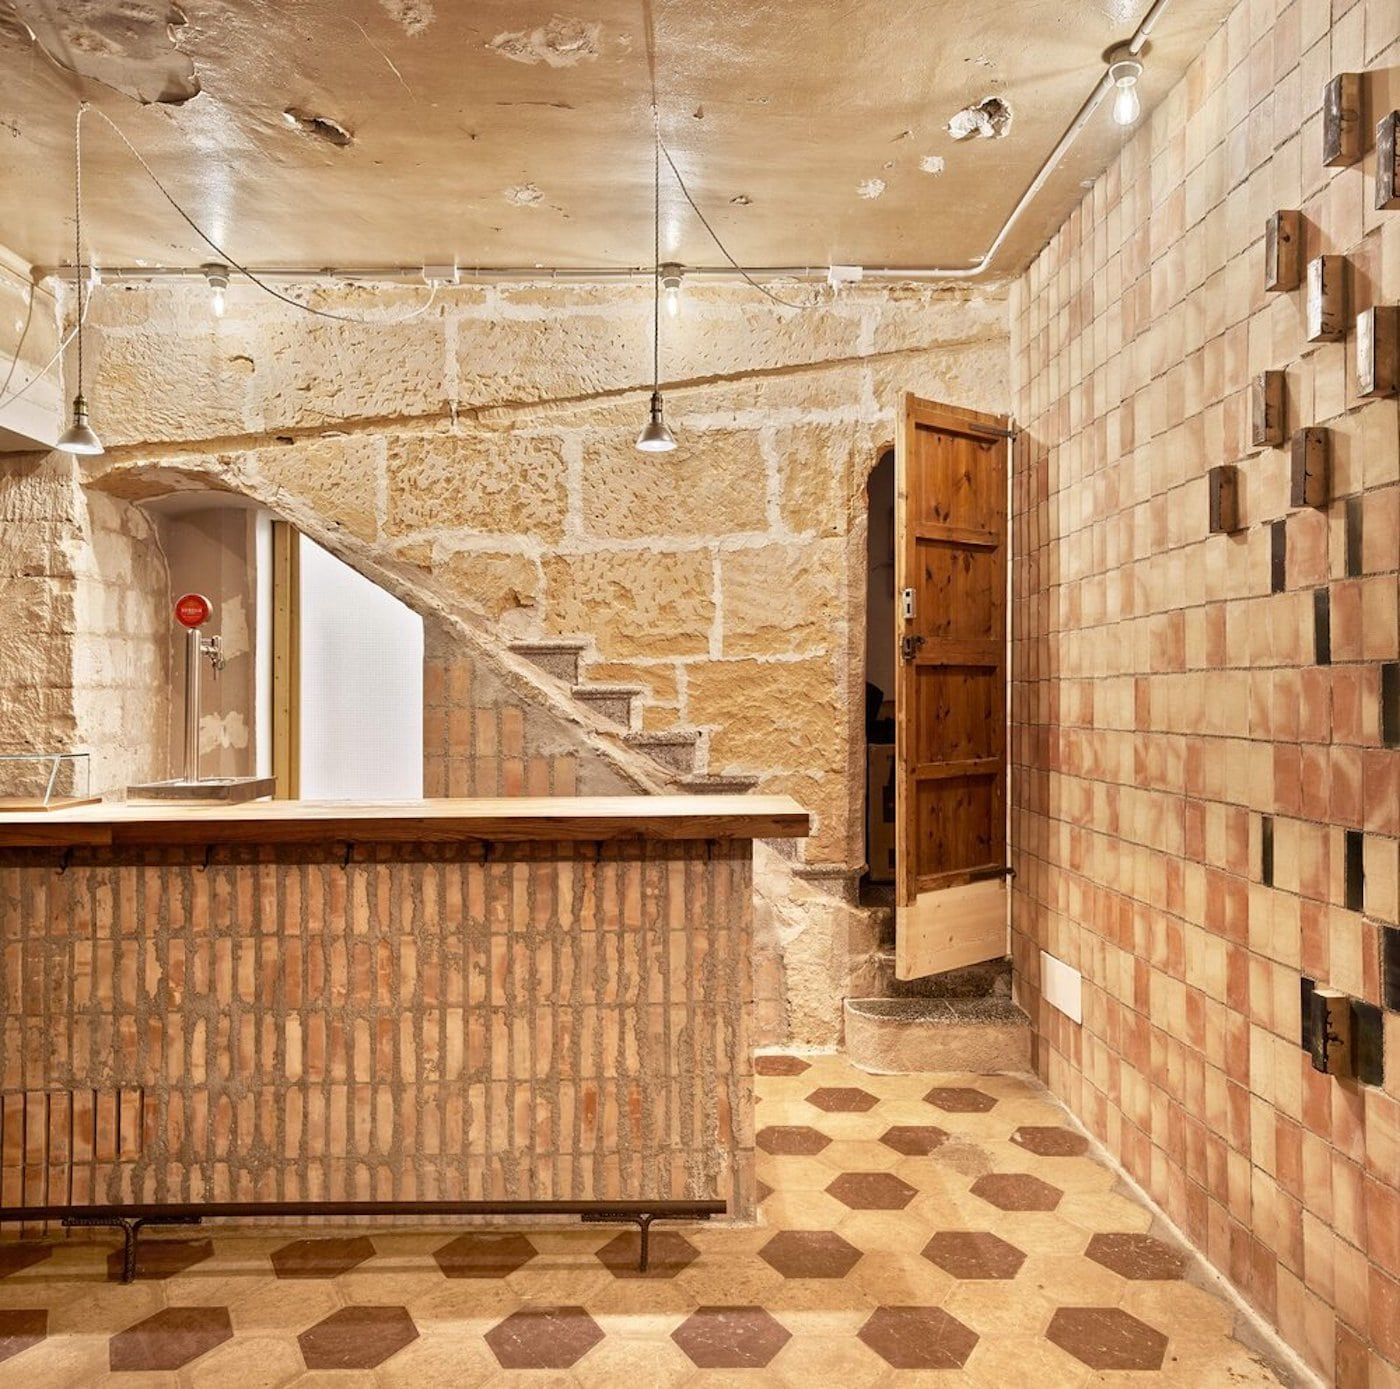 Sandstone and vertical bricks in adaptive reuse cafe